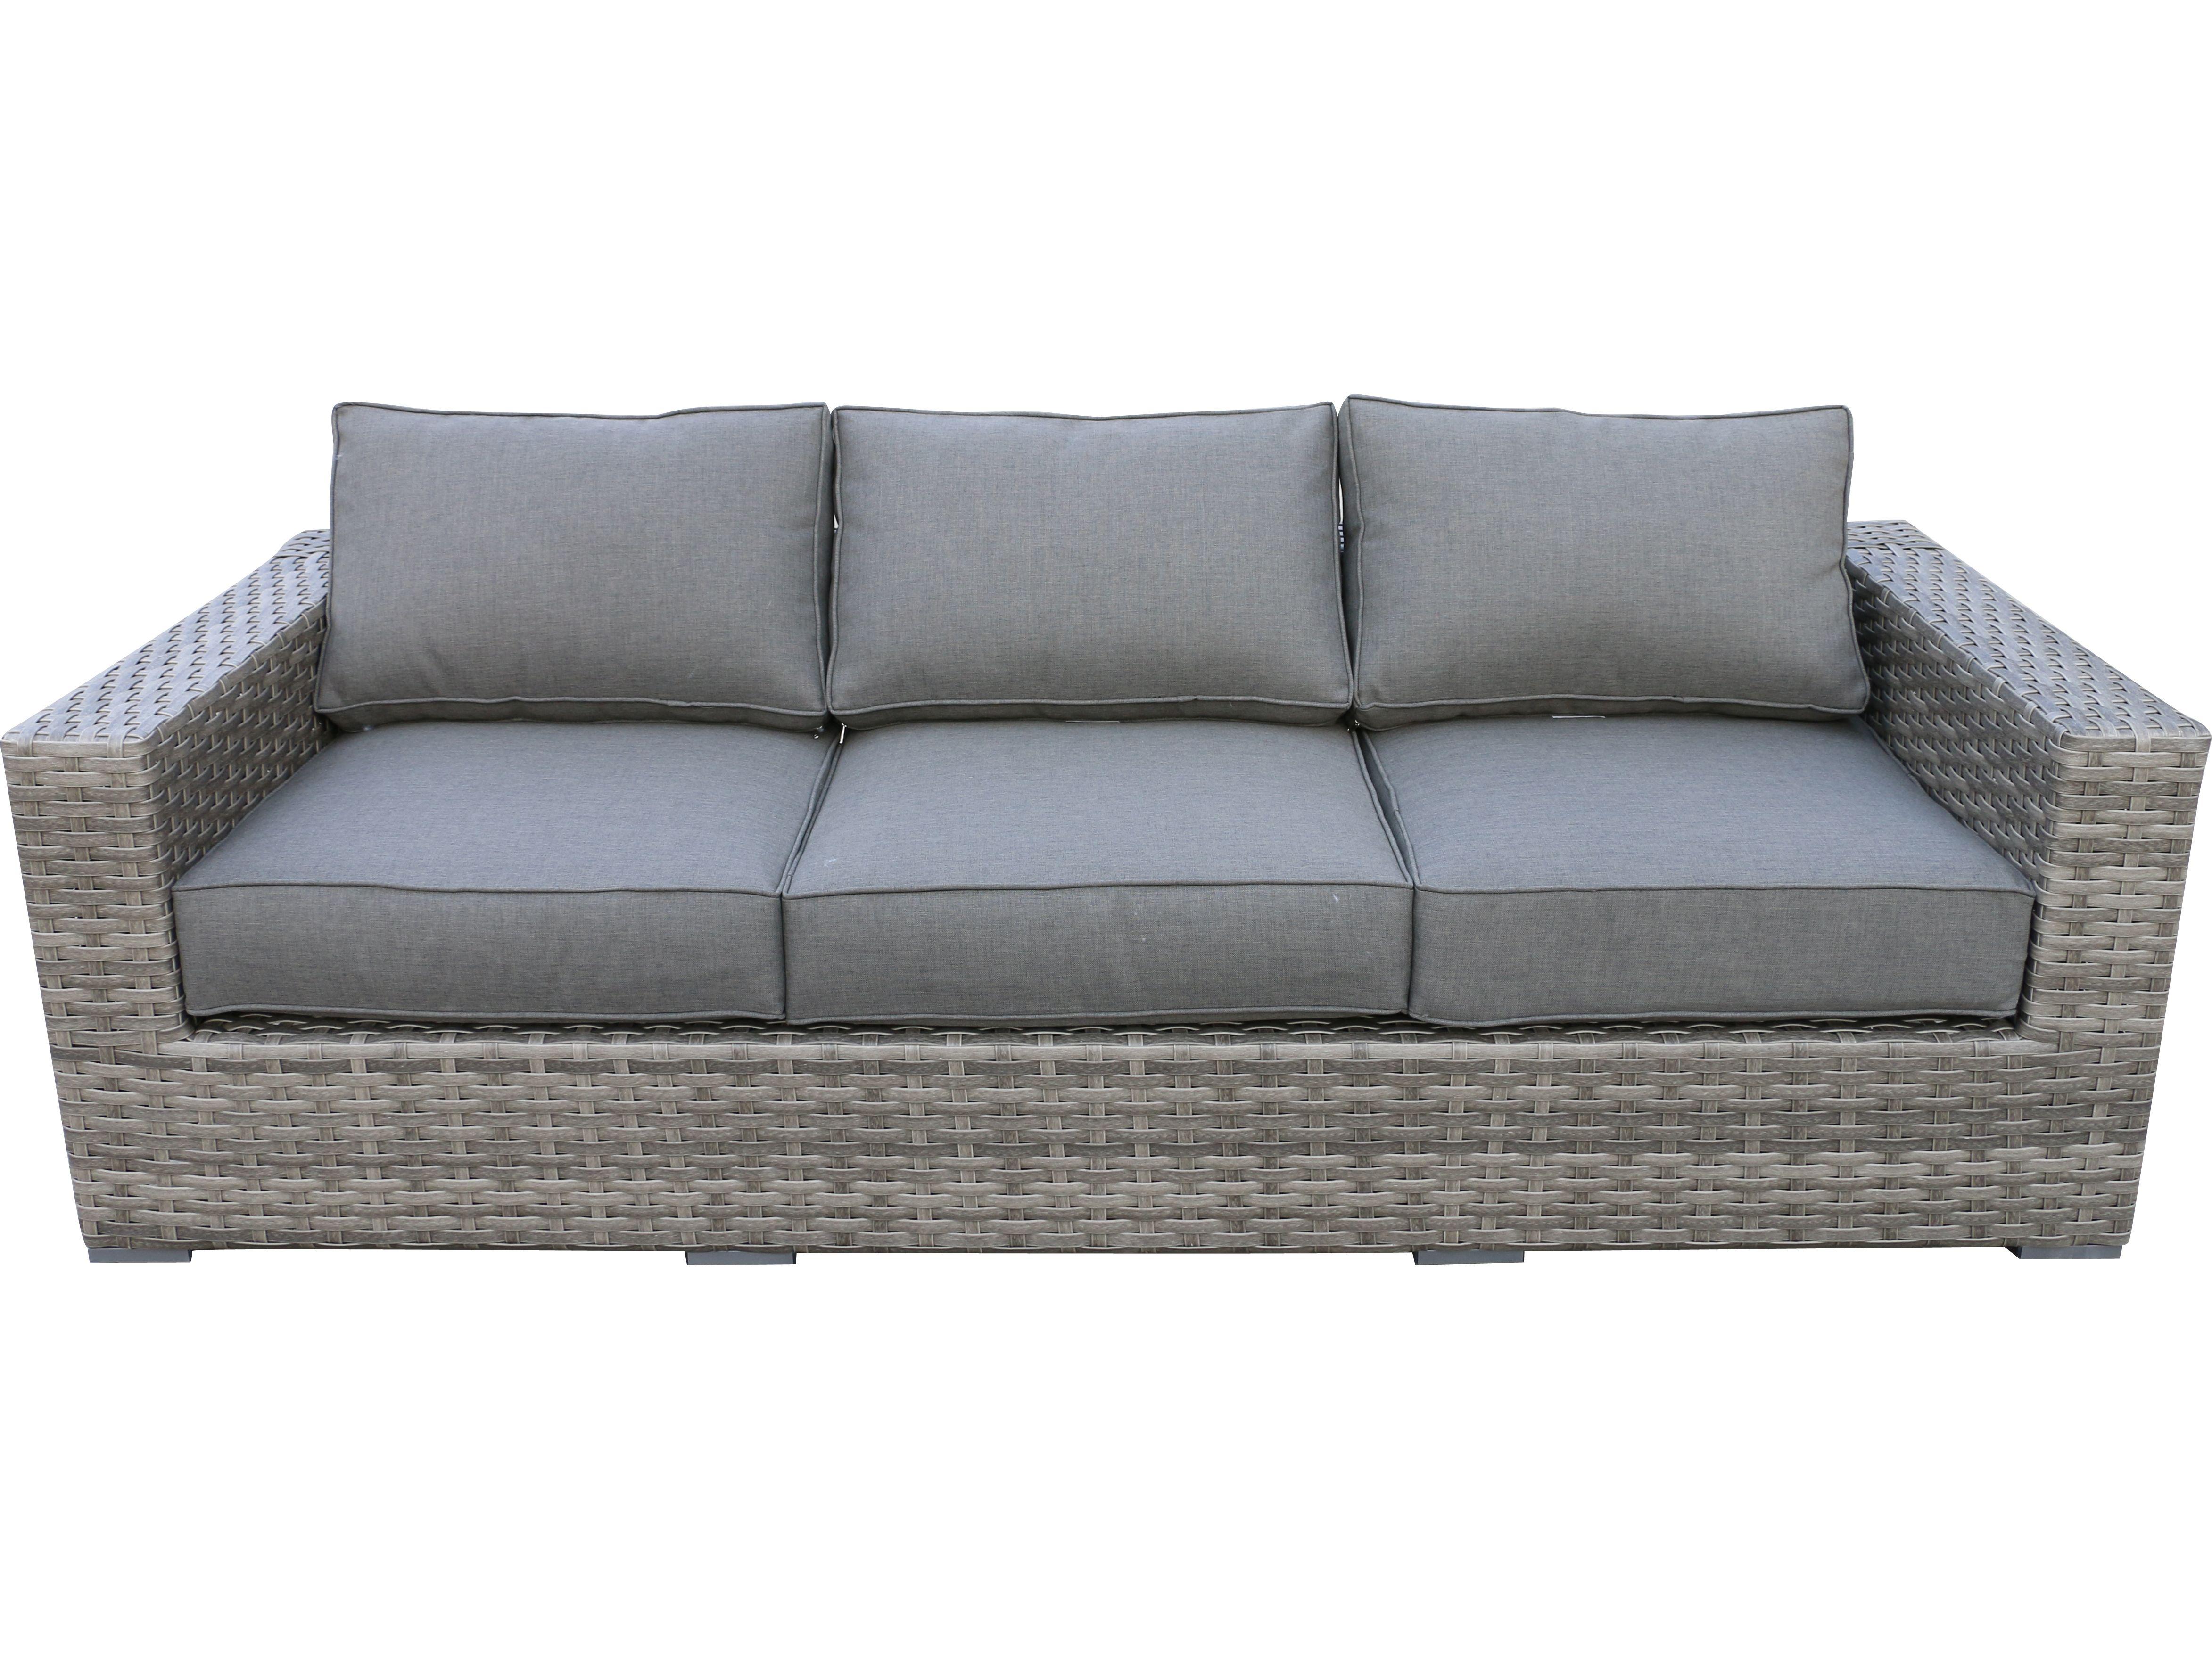 Teva Bali Wicker Sofa Wicker Sofa Outdoor Sofa Comfortable